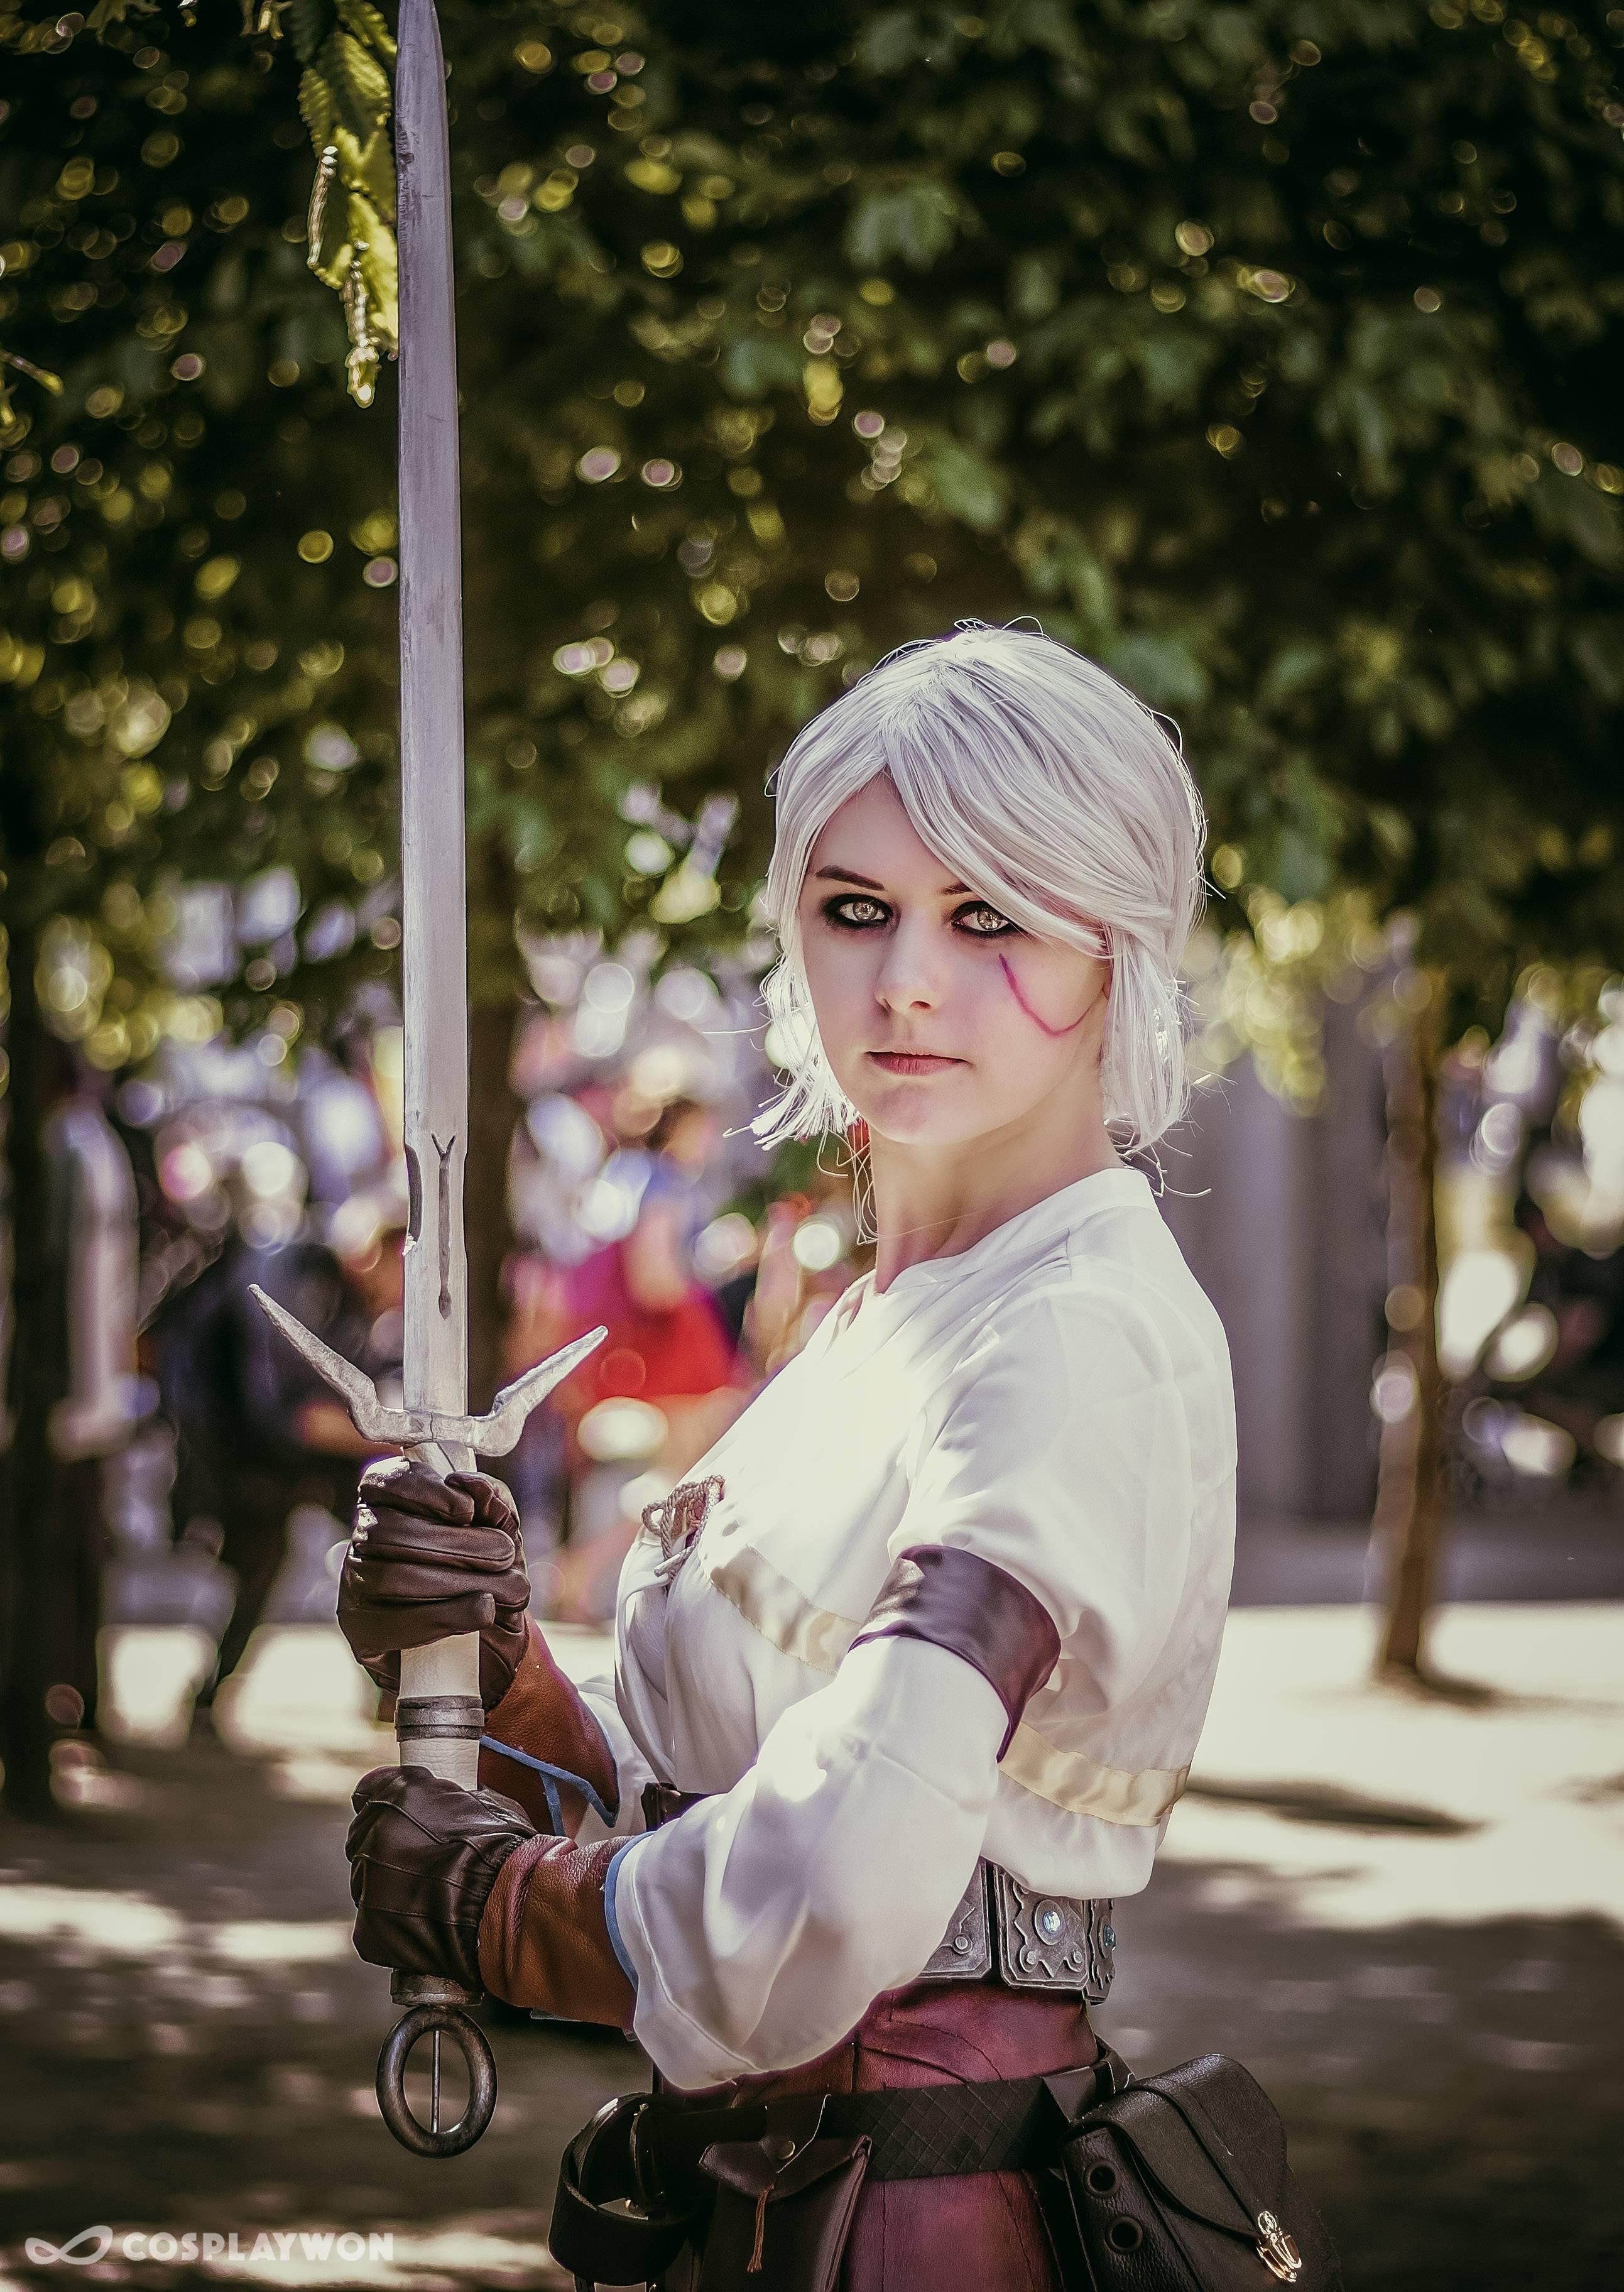 Lena (LenaMay cosplay) Liked Posts - CosplayWon